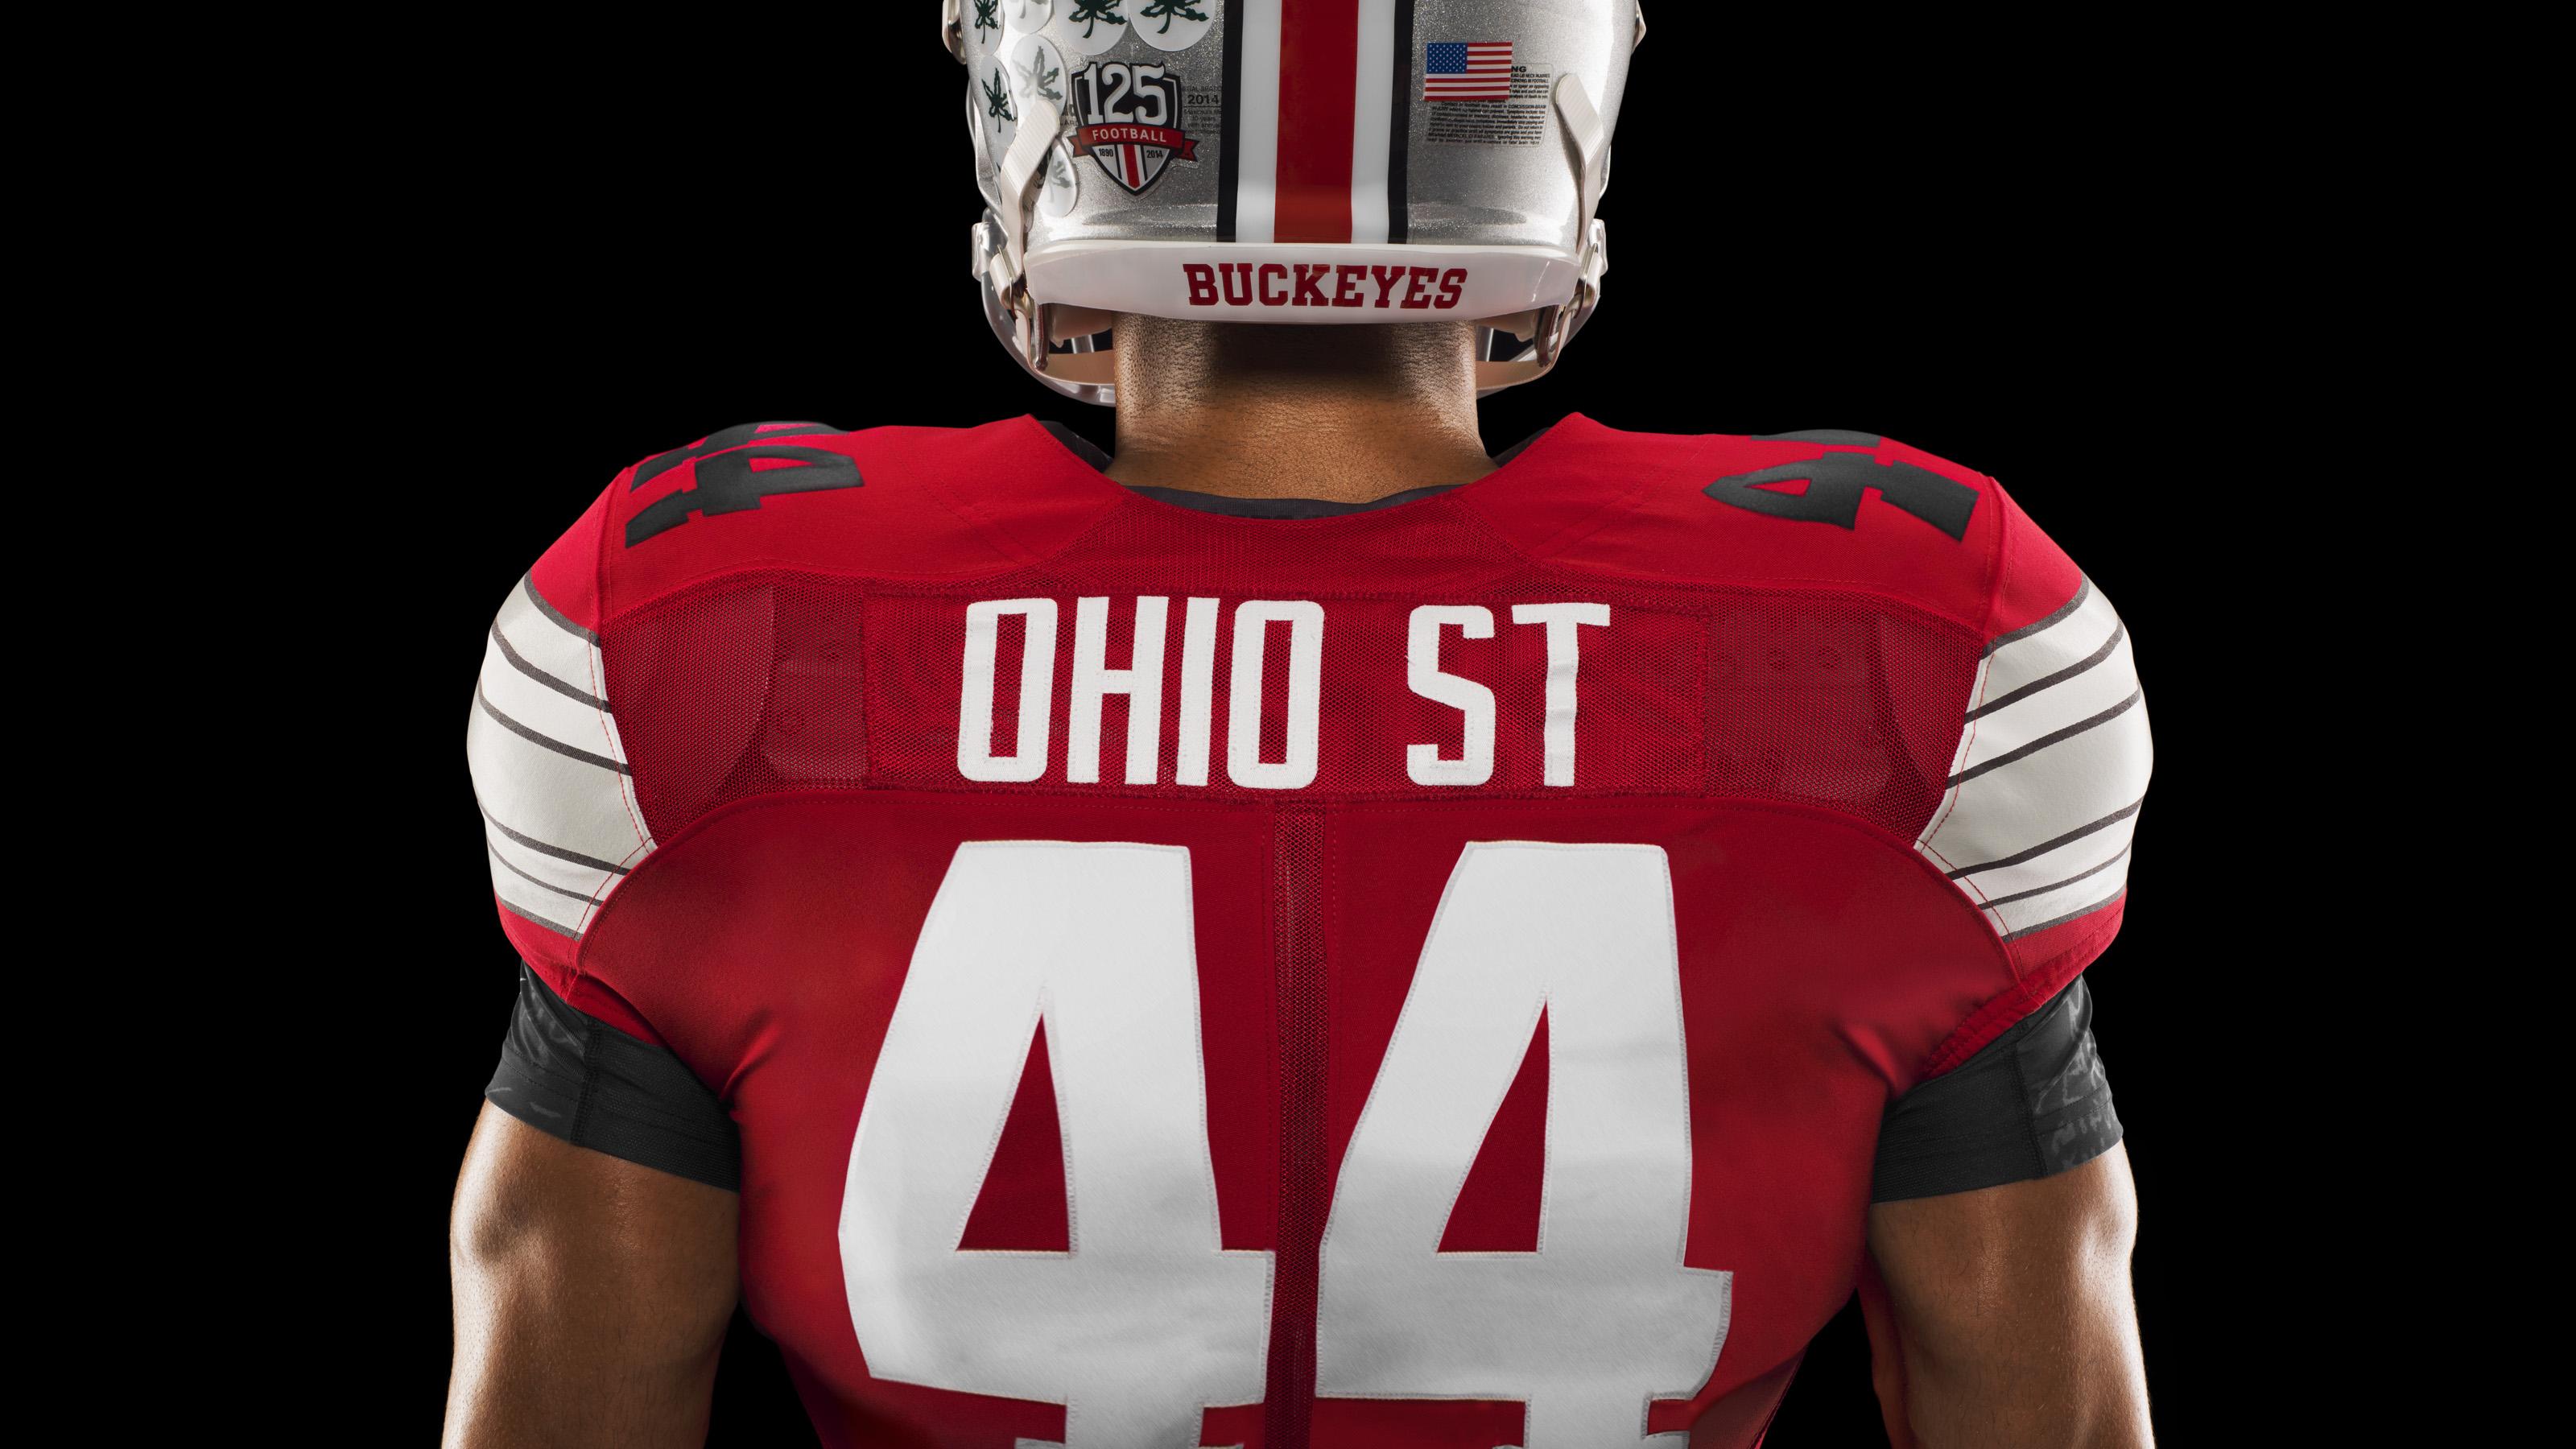 ohio state football championship jersey